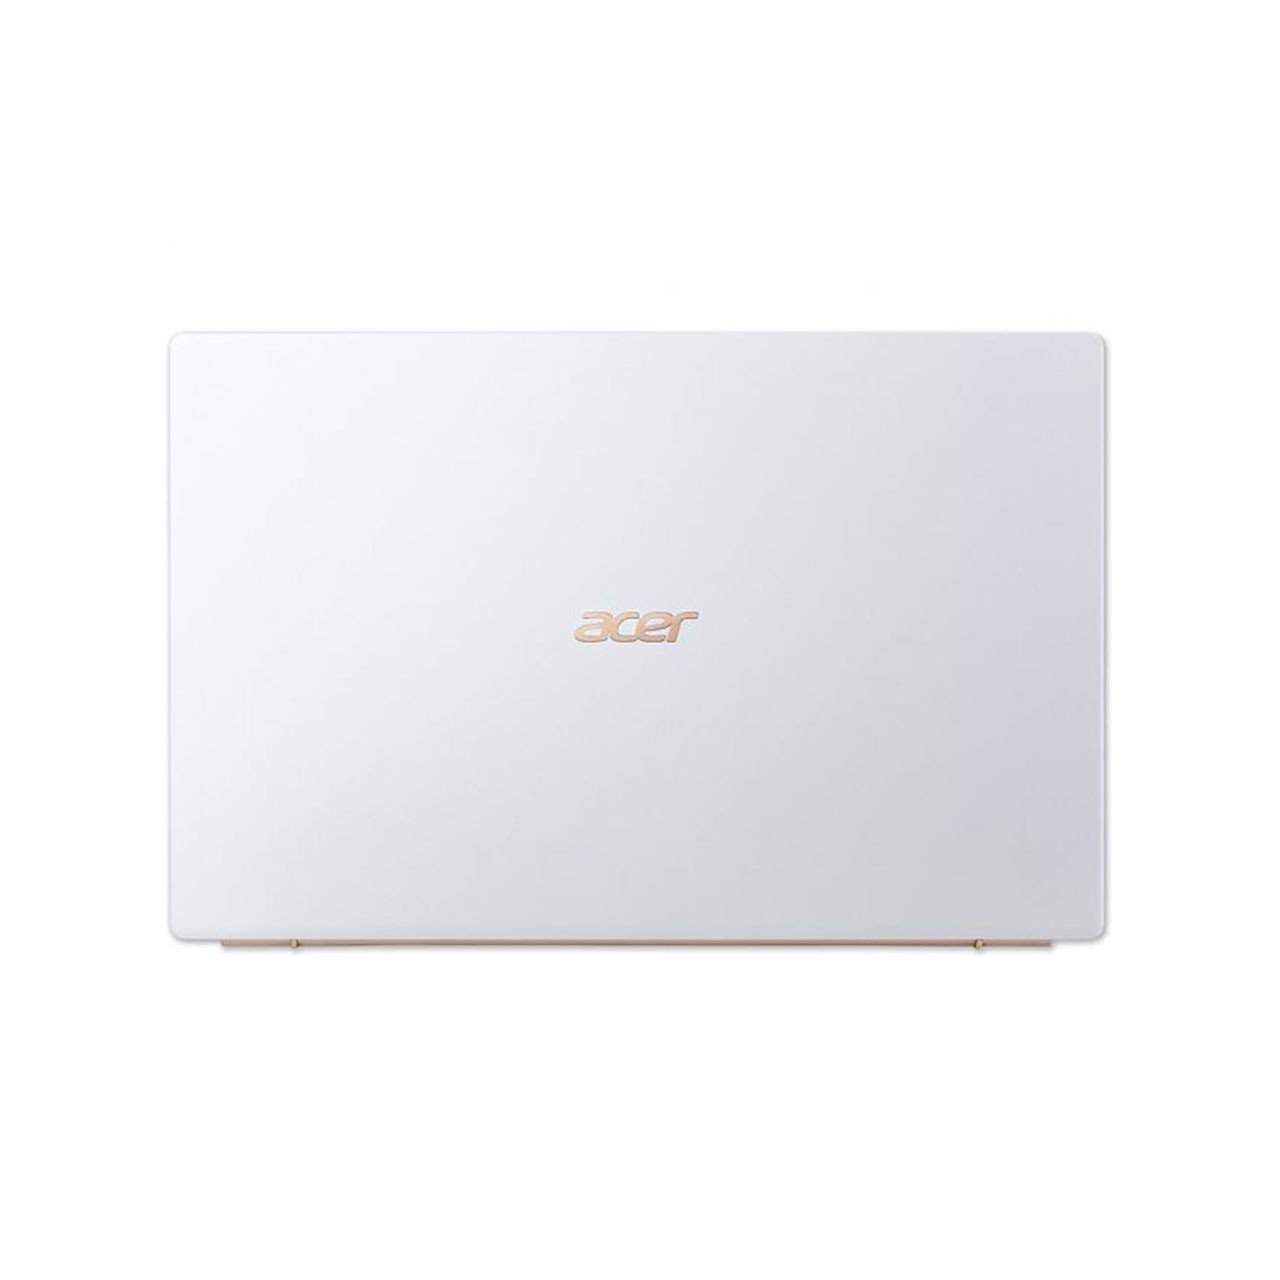 ACER ASPIRE SWIFT SF514-54GT-51RG